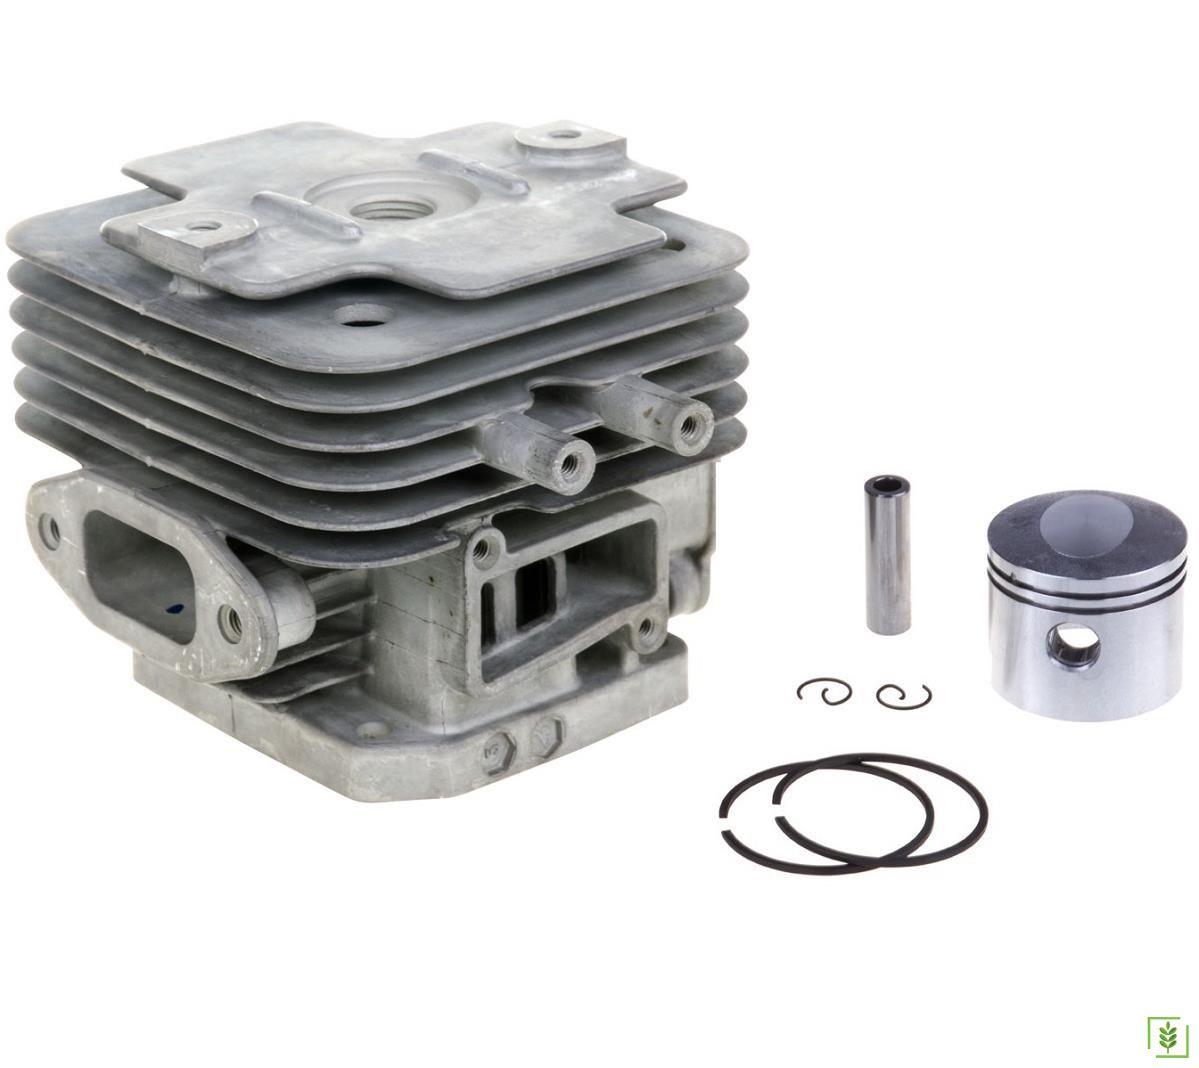 Kawasaki TJ53 Motorlu Tırpan Silindir Ve Piston Set 44 mm